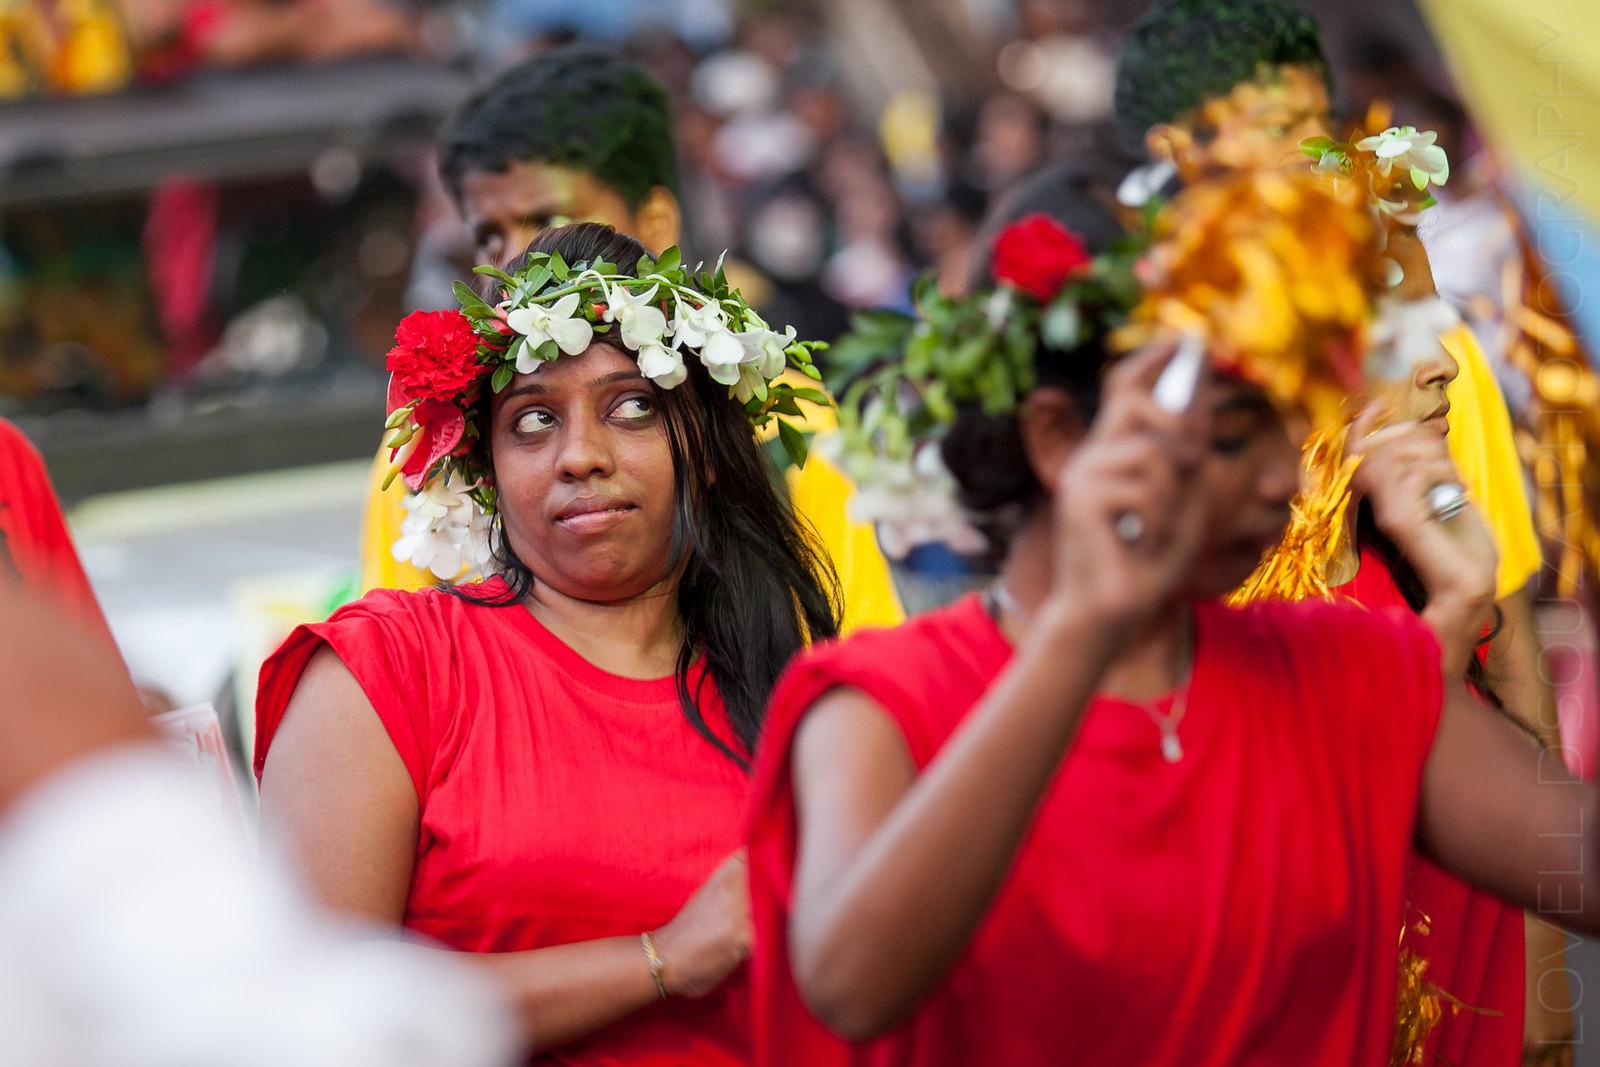 Viva Carnaval — Scenes from the Goa Carnival 2015 · Goa · Happy Feet